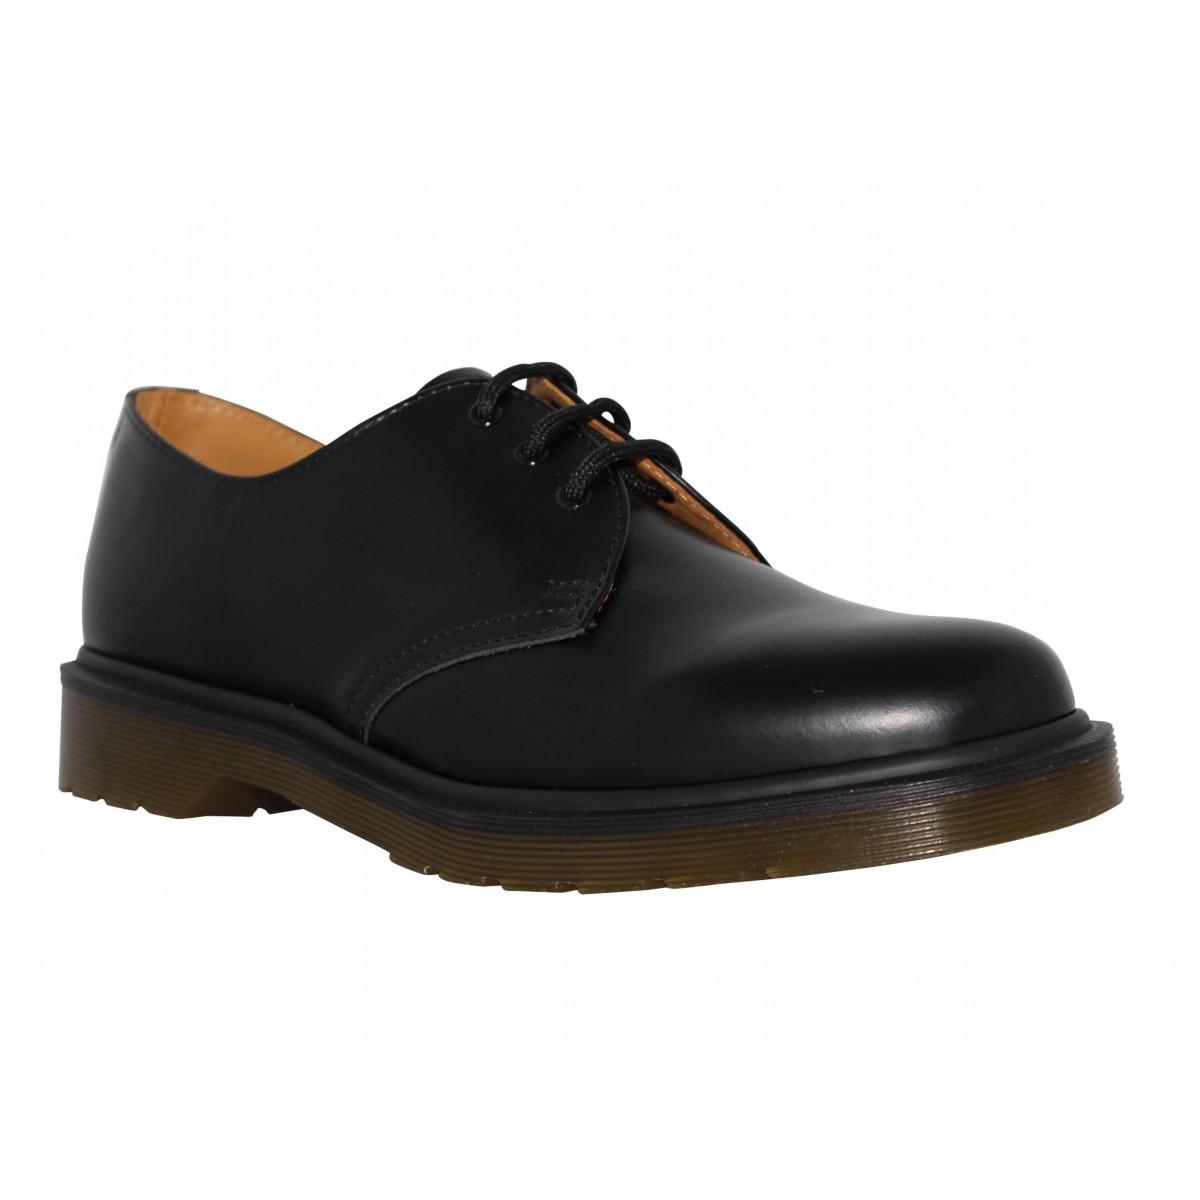 dr martens 1461 cuir homme noir fanny chaussures. Black Bedroom Furniture Sets. Home Design Ideas